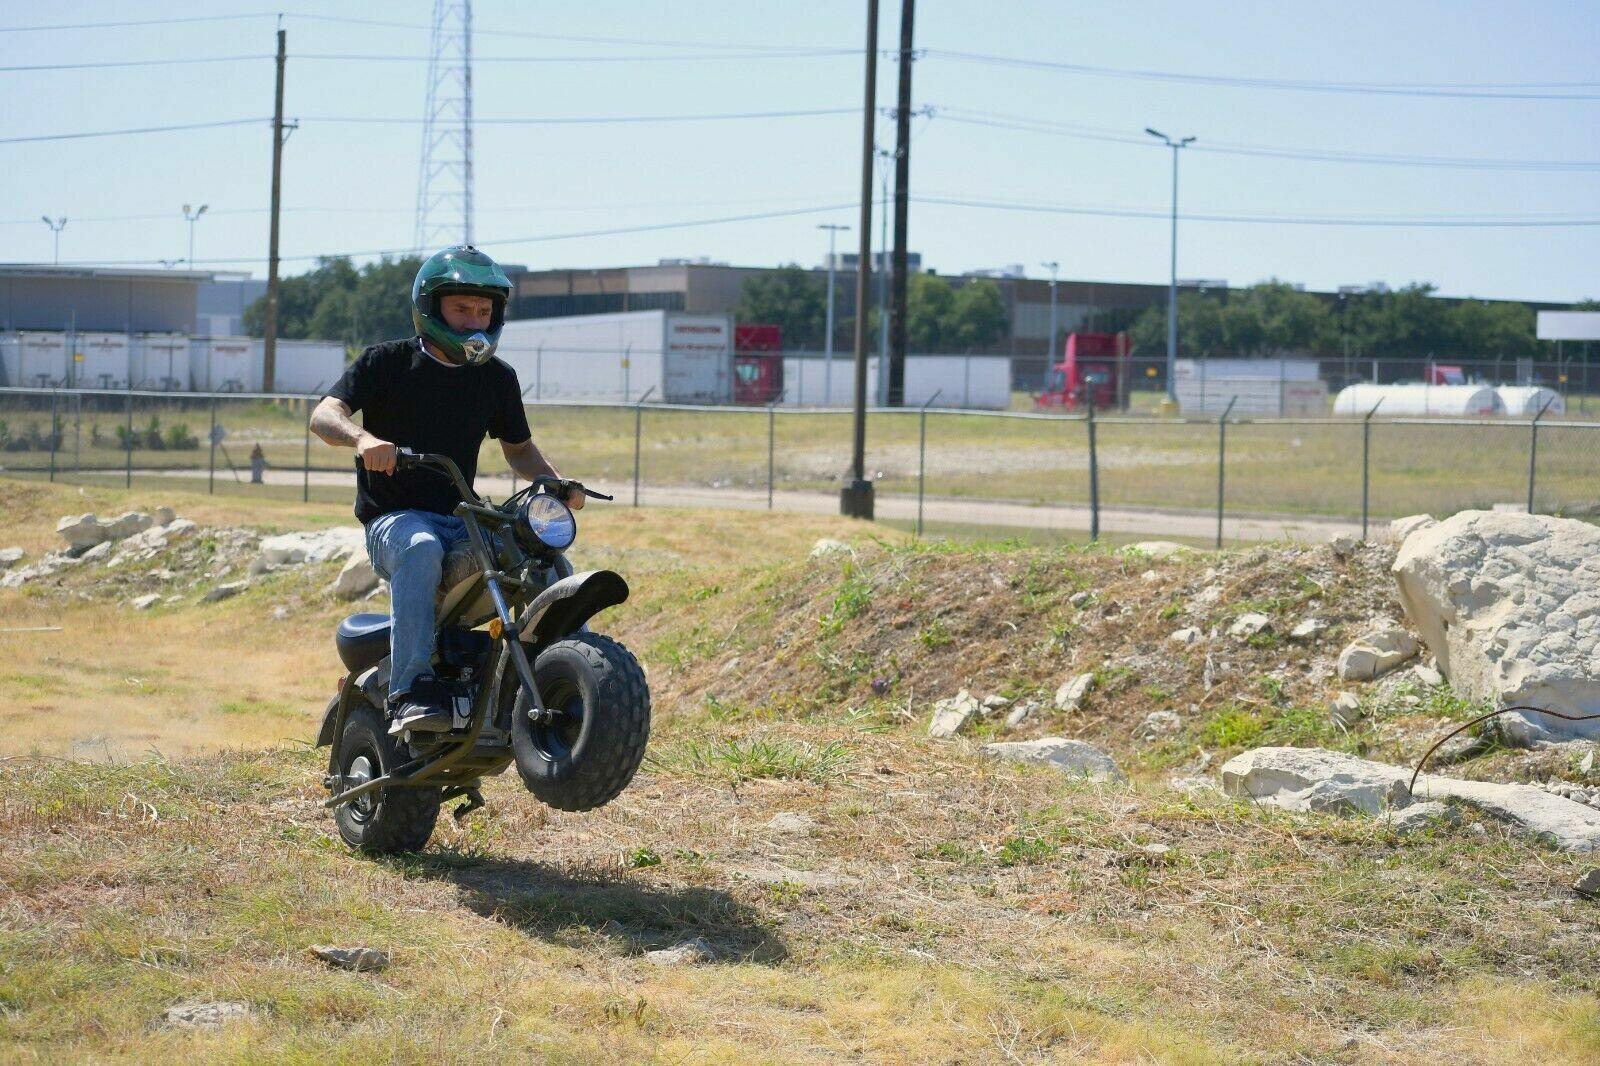 MASSIMO MB200 SUPERSIZED 196cc MINI BIKE - Motorcycle Outdoo